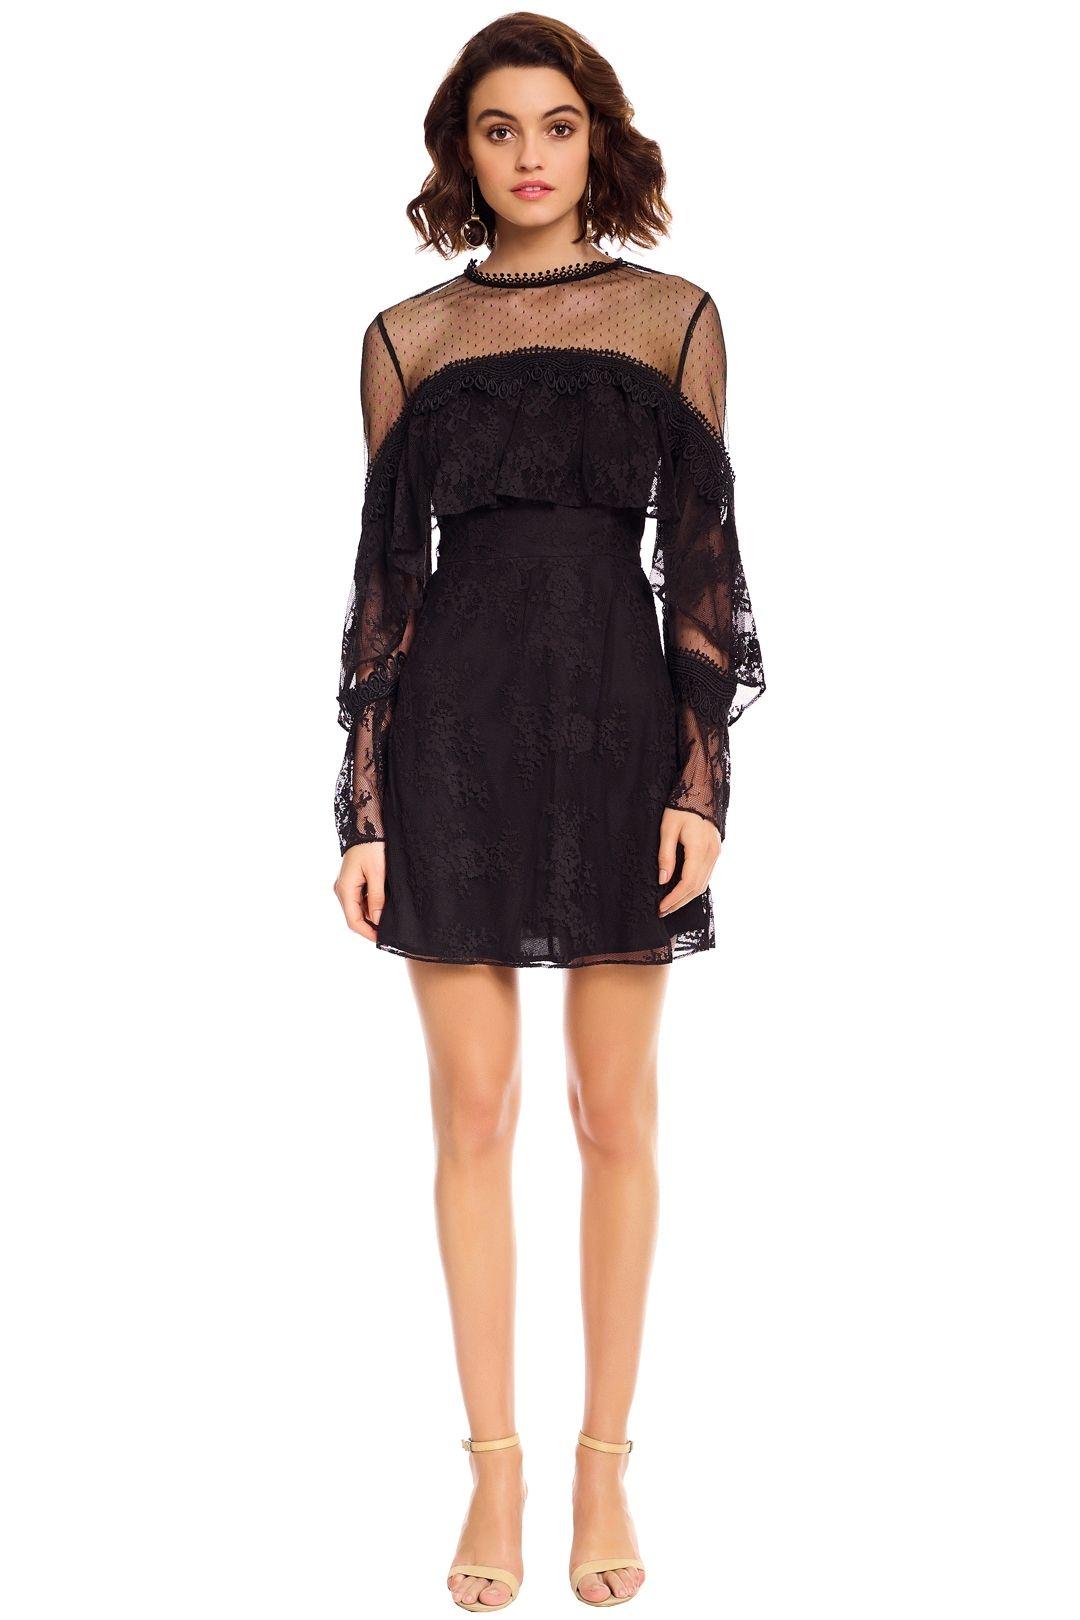 Talulah - True Chemistry Mini Dress - Black - Front